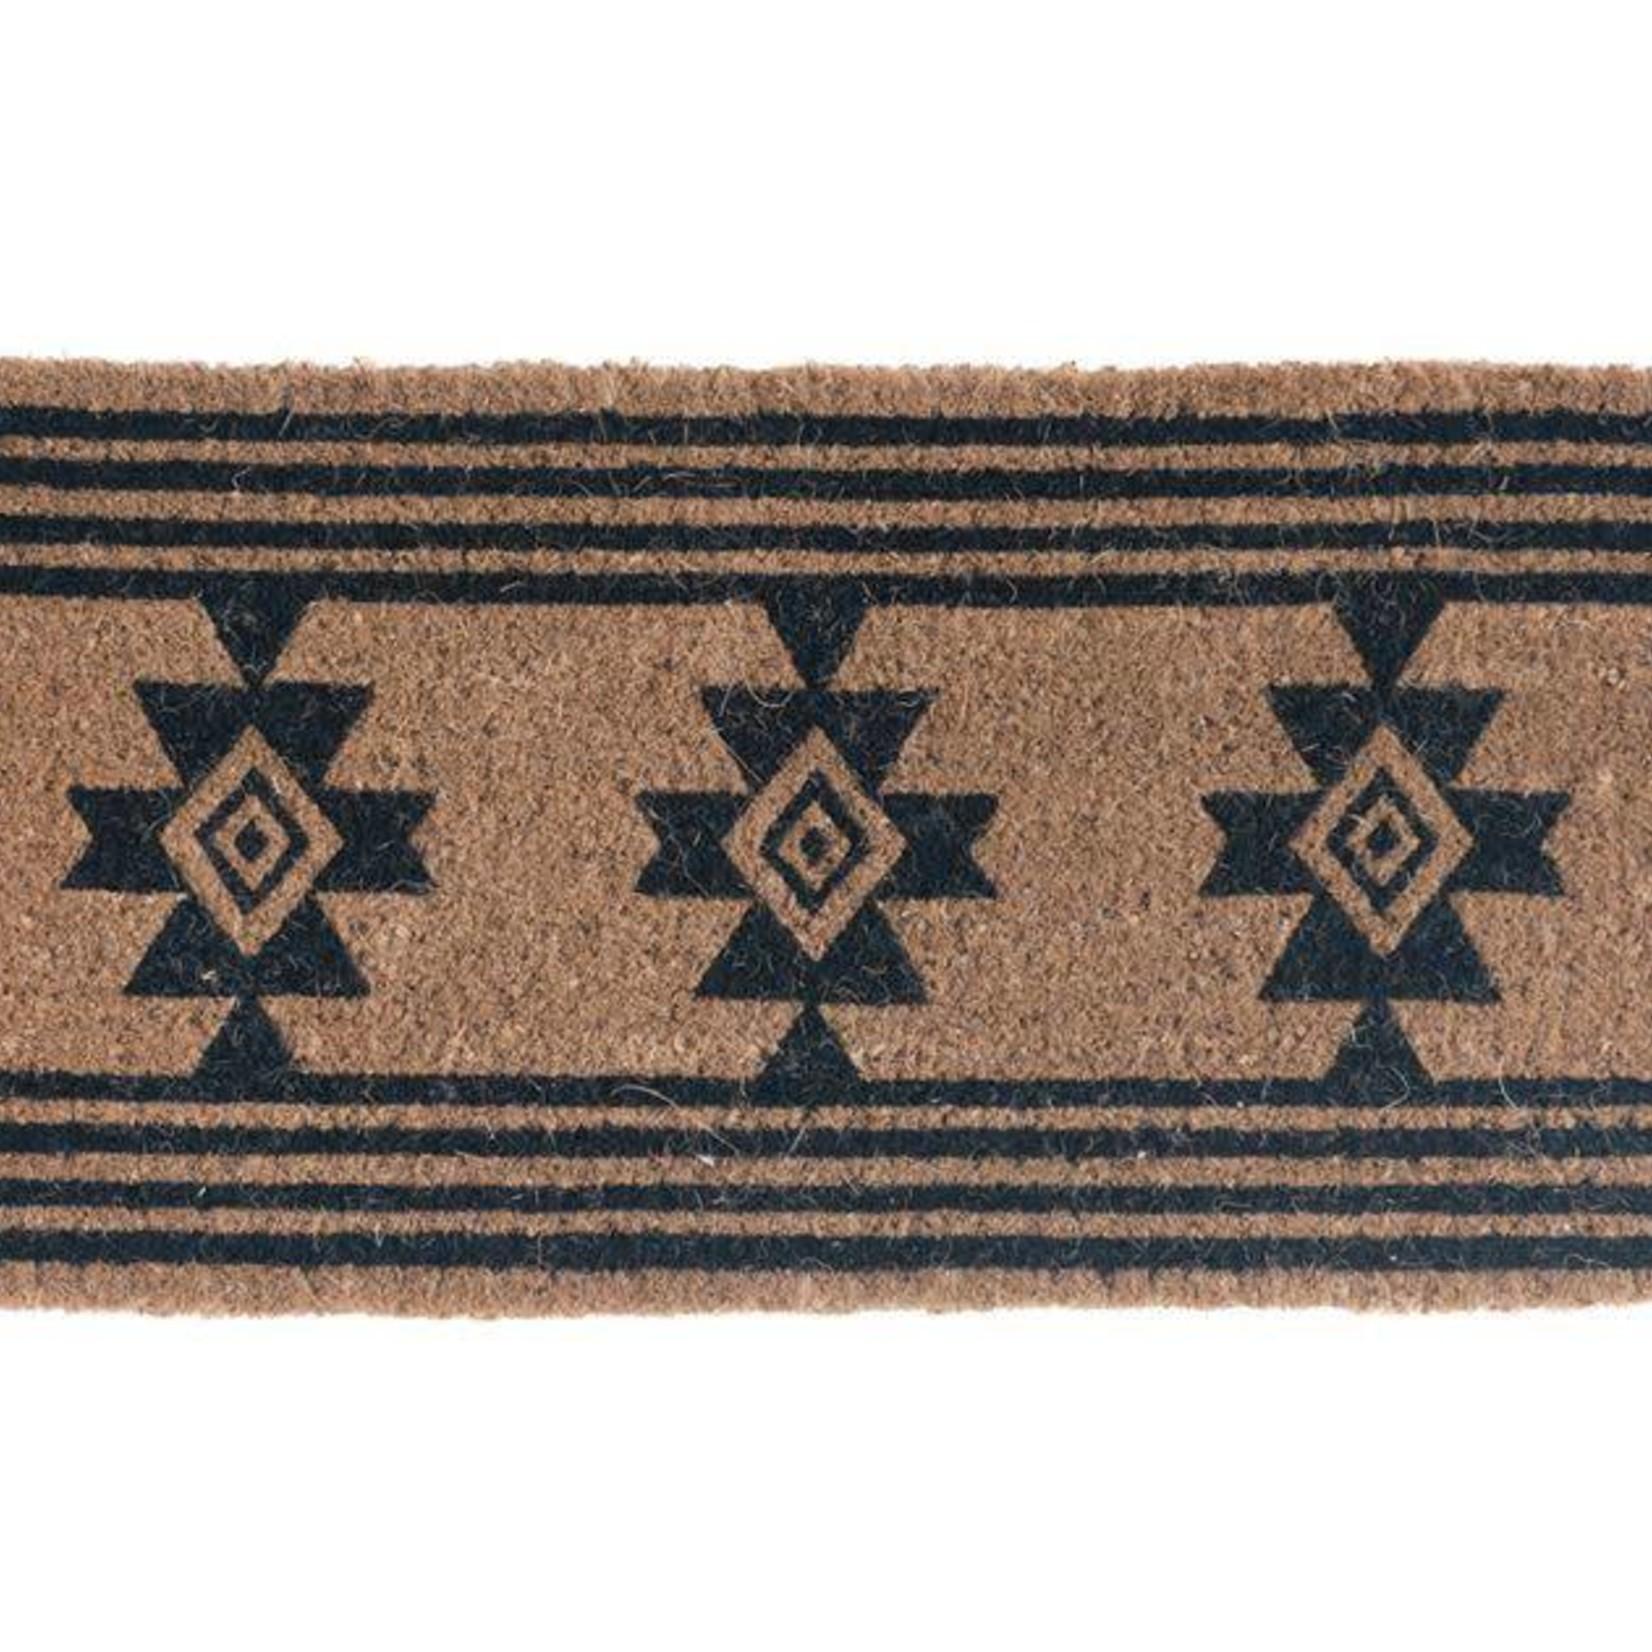 Natural Coir Doormat w/ Aztec Pattern DA9924